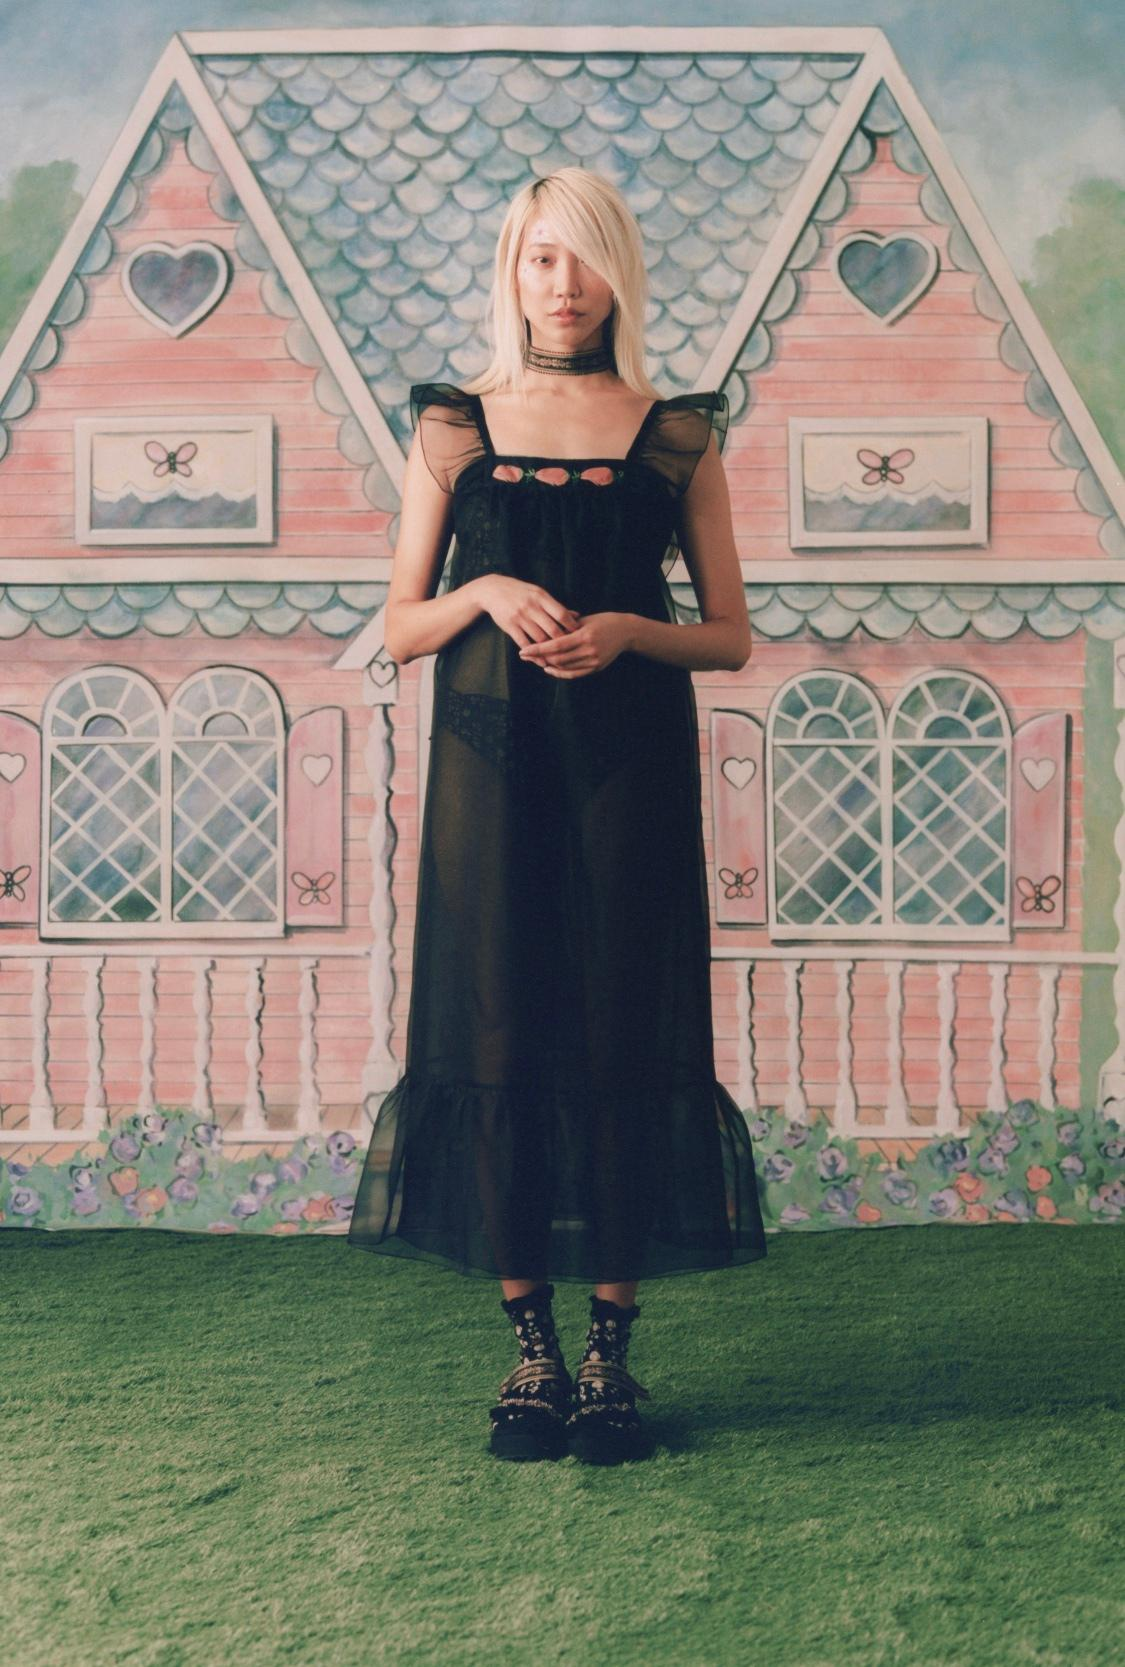 Anna Sui S/S 2021安娜苏春夏系列,是熟悉的印花少女系……